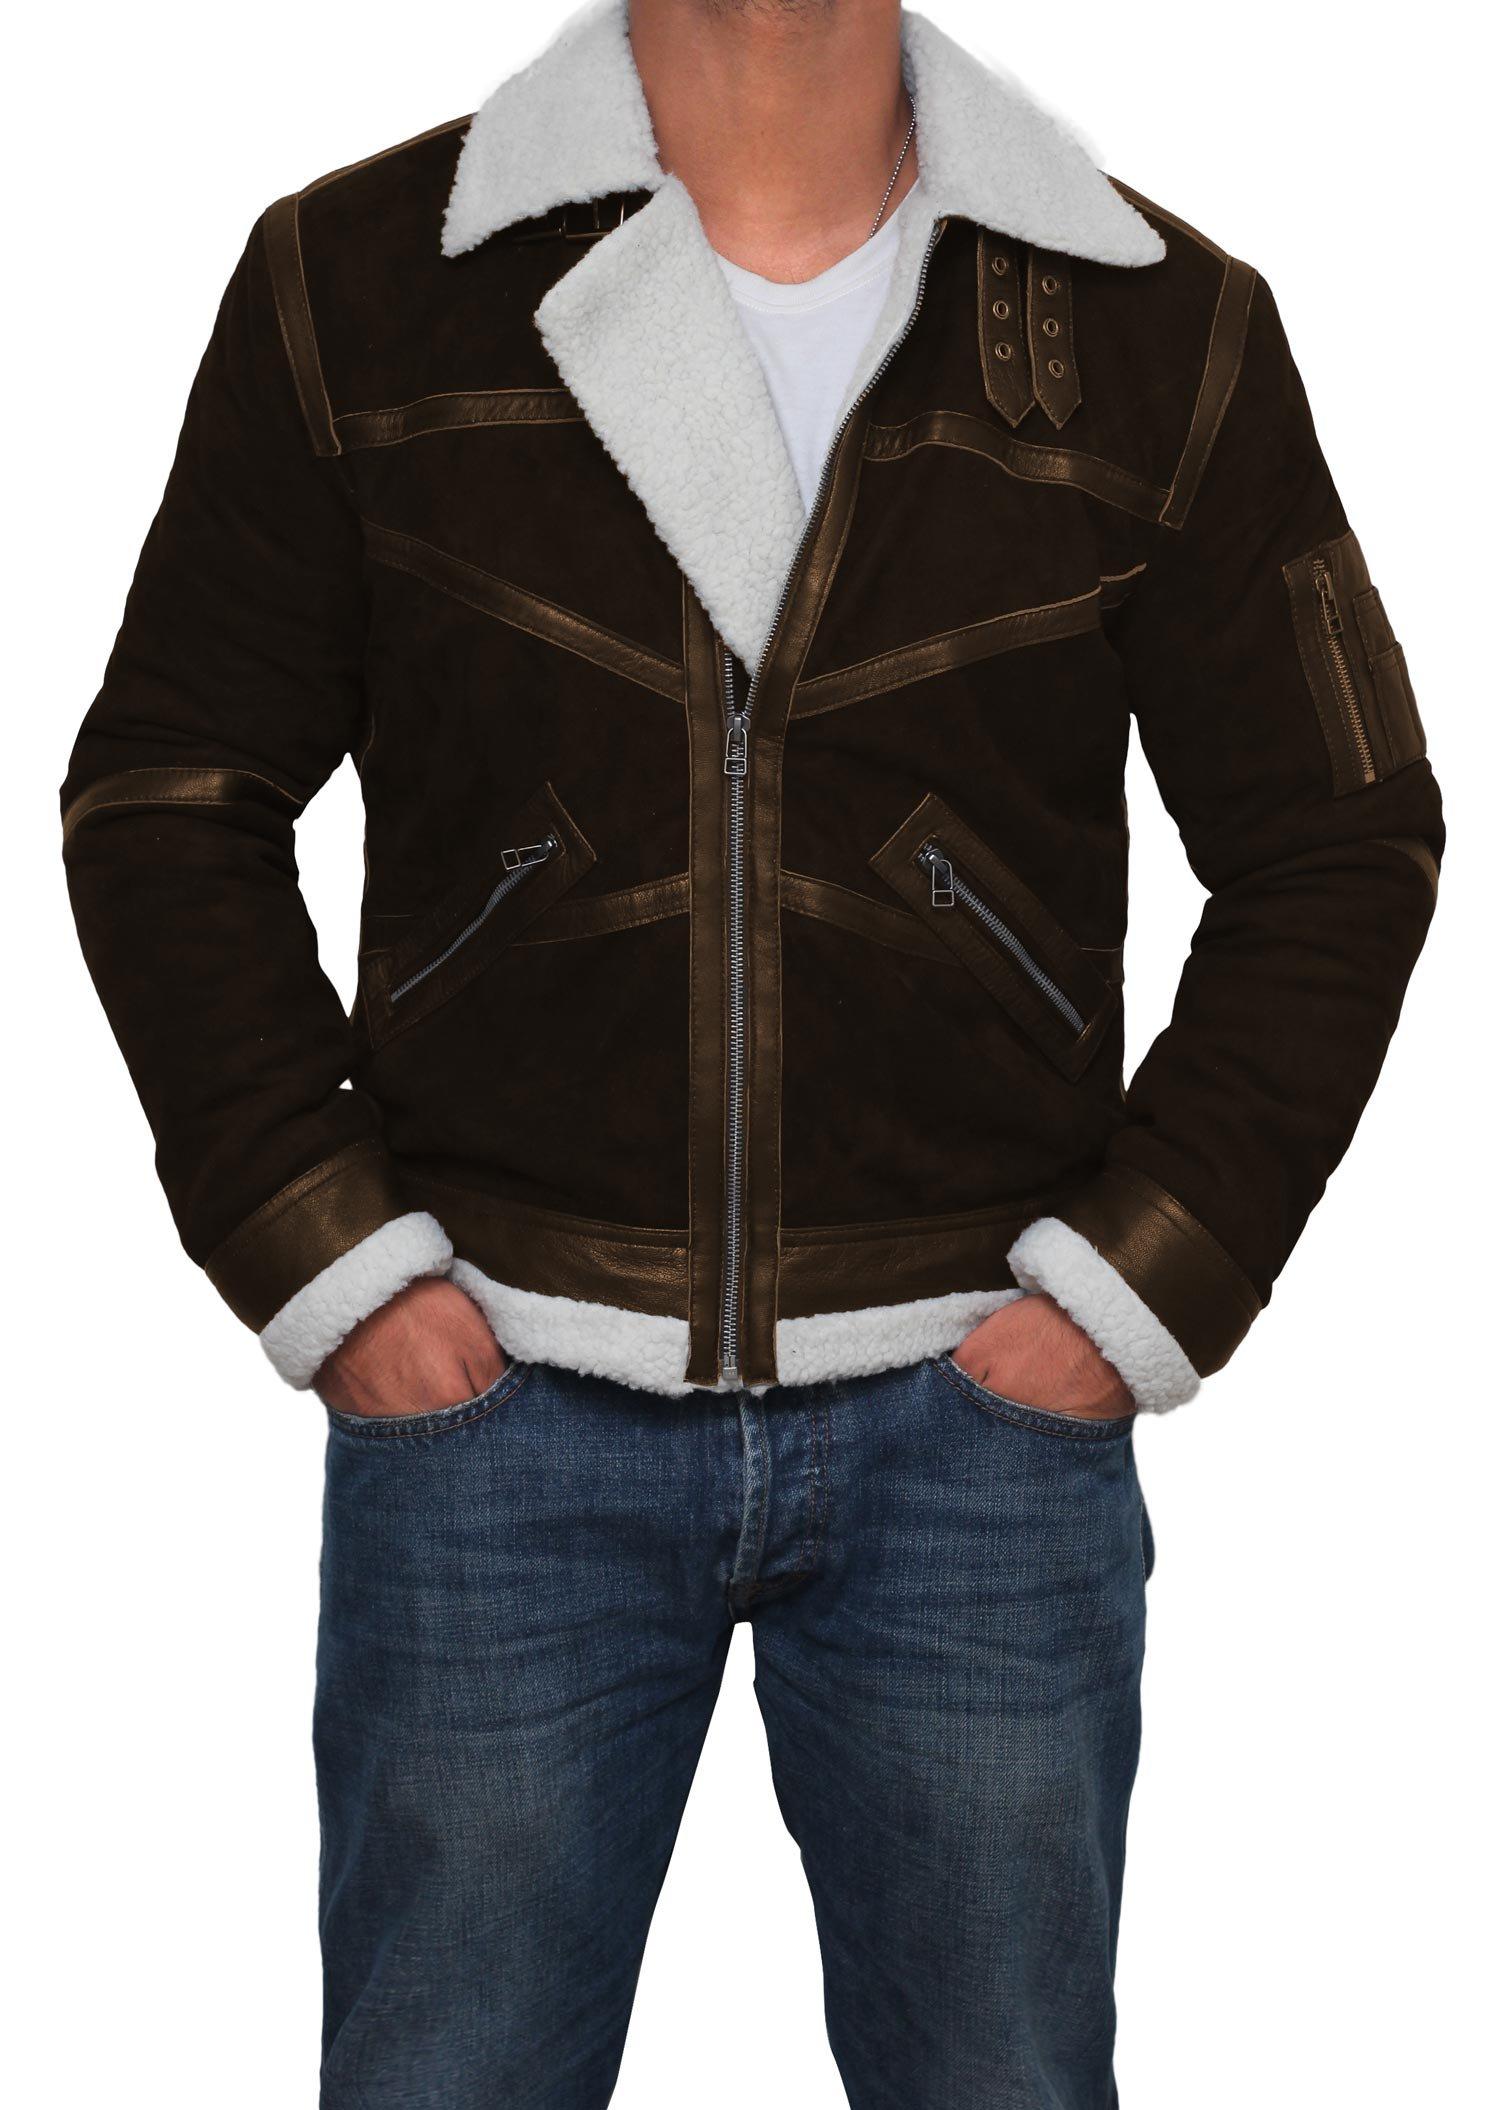 Mens Tom Cruise Jack Reacher Jacket - Leather Motorcycle Jacket (Brown - Power 50 Cent Jacket, XL)